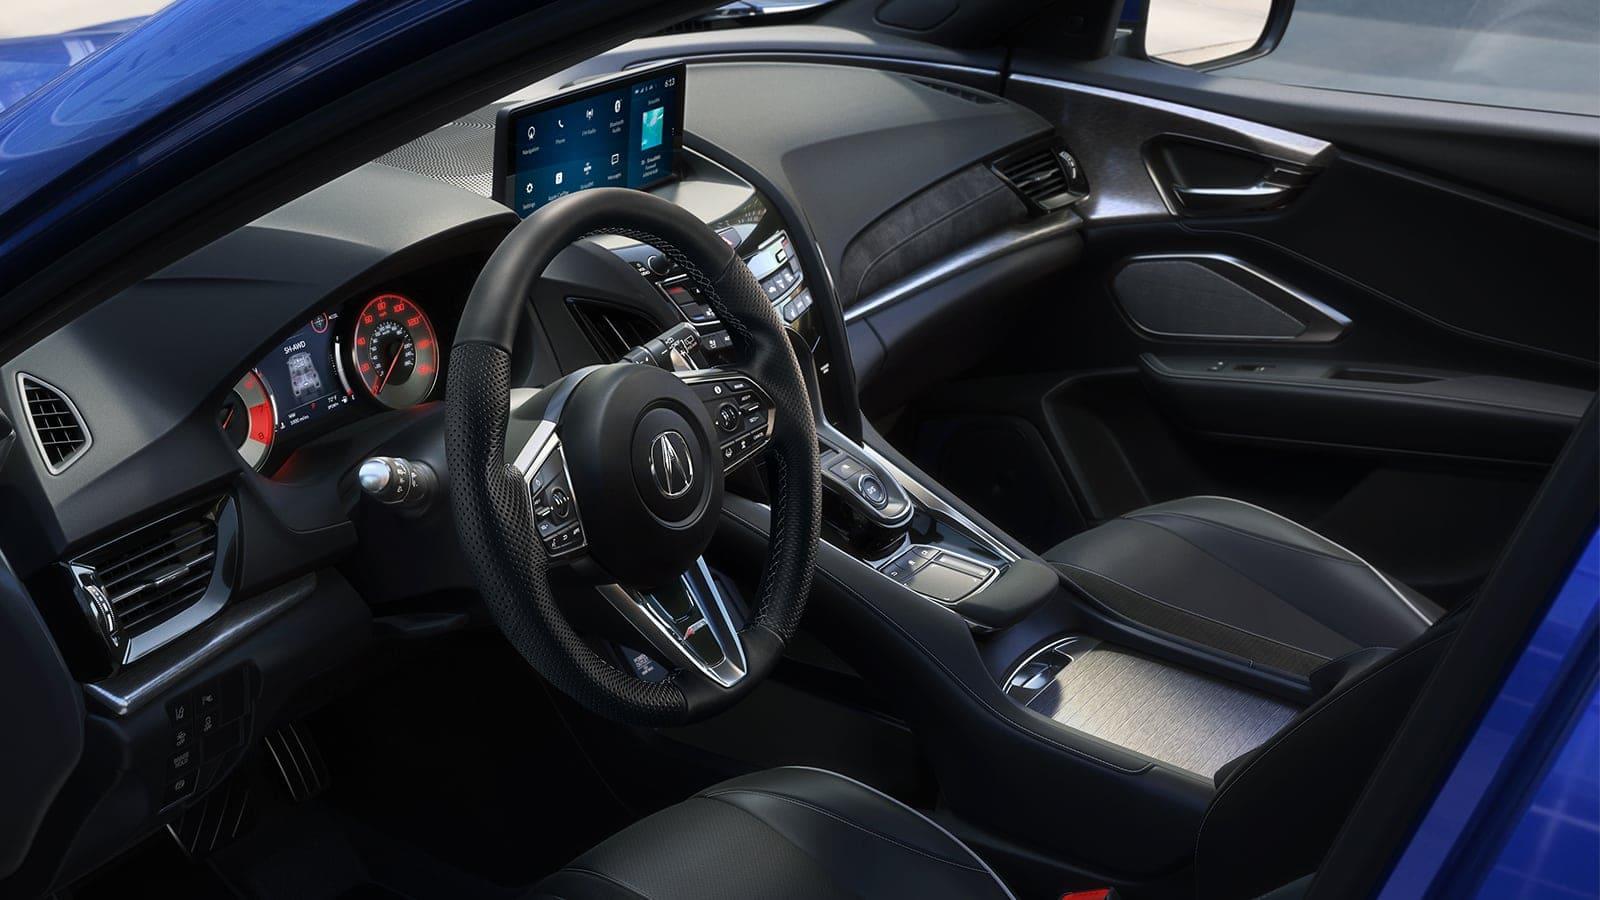 2020 Acura RDX Center Stack